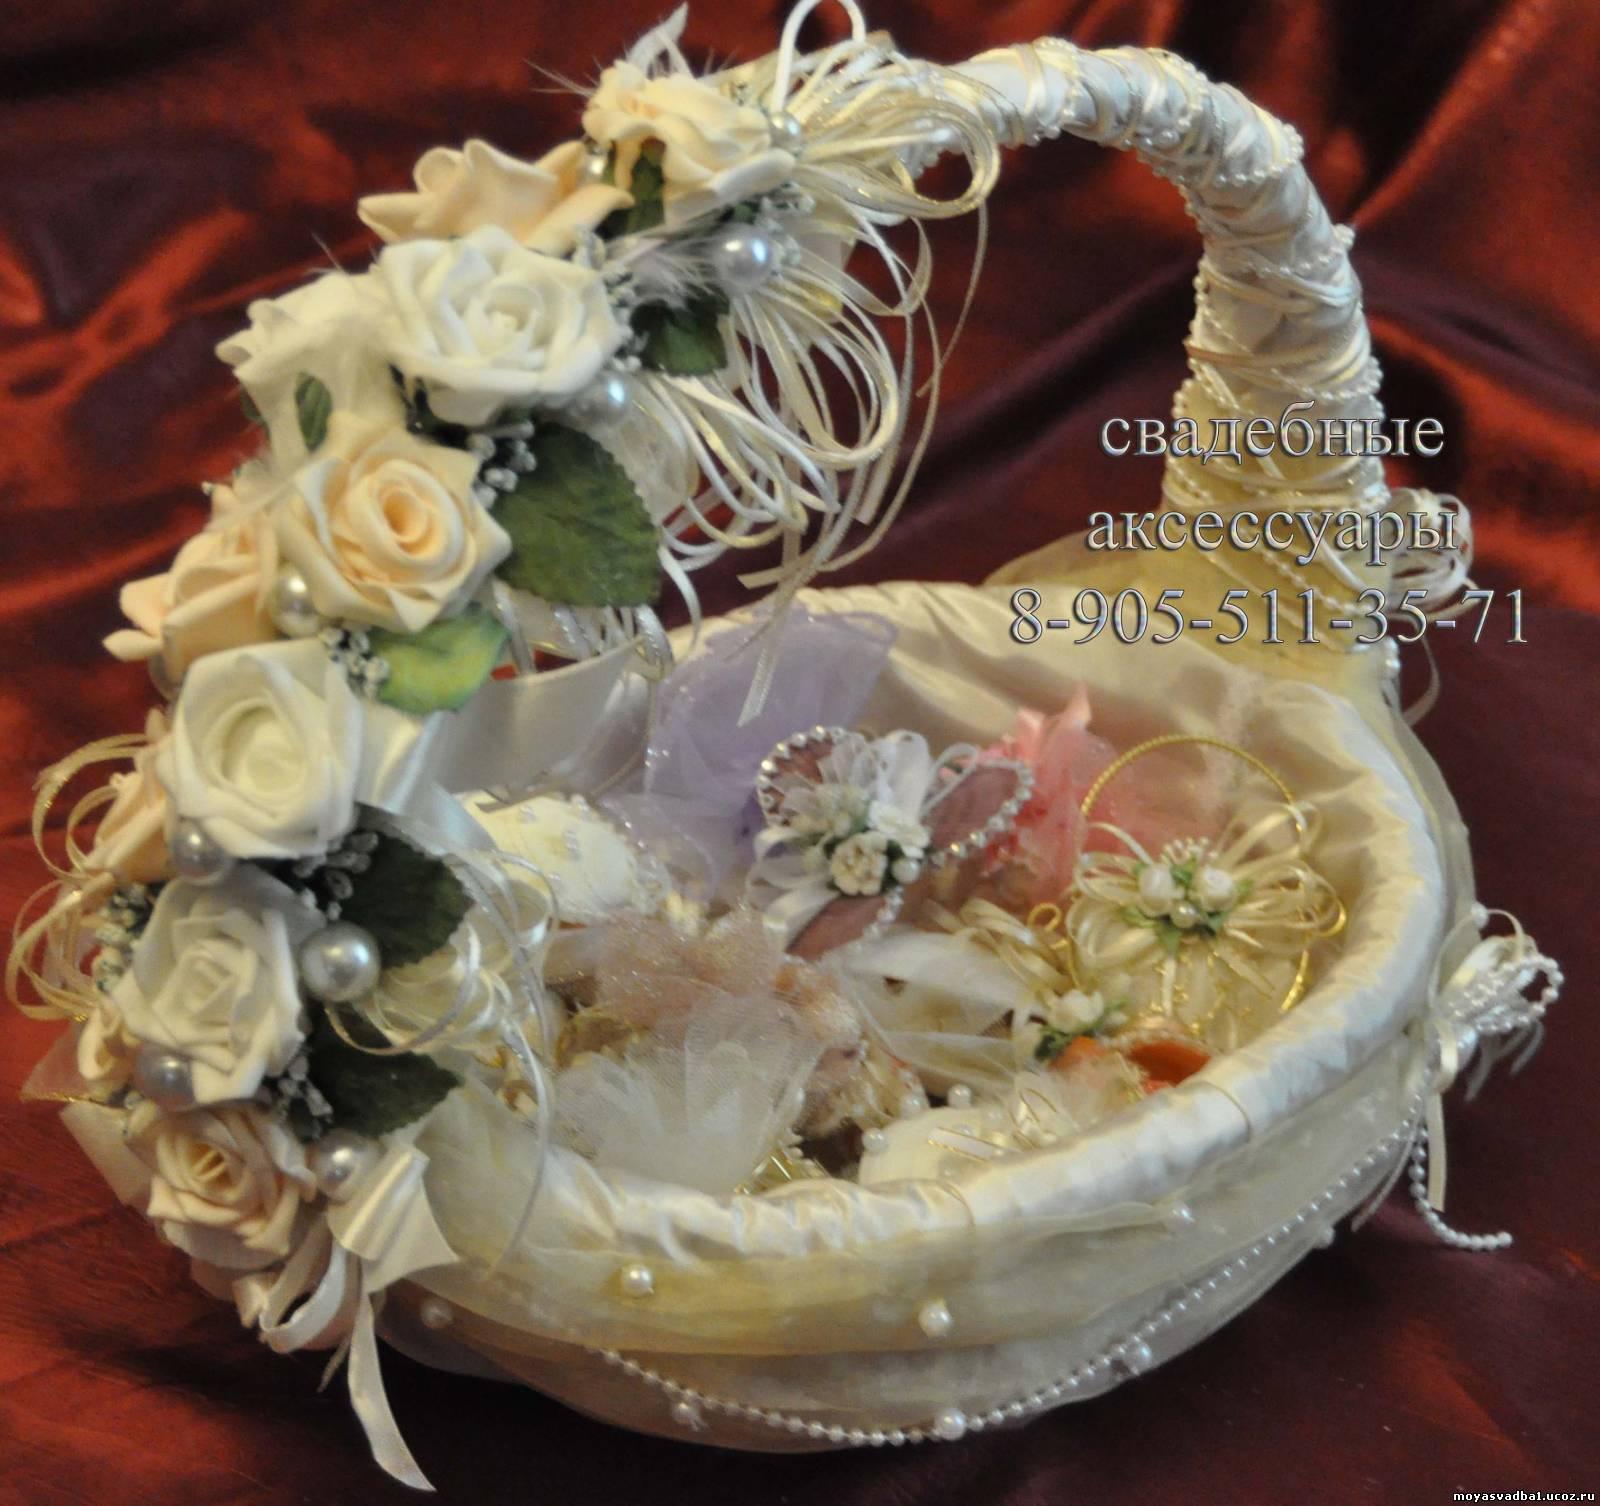 Подарки на свадьбу - купить Подарки на свадьбу 78